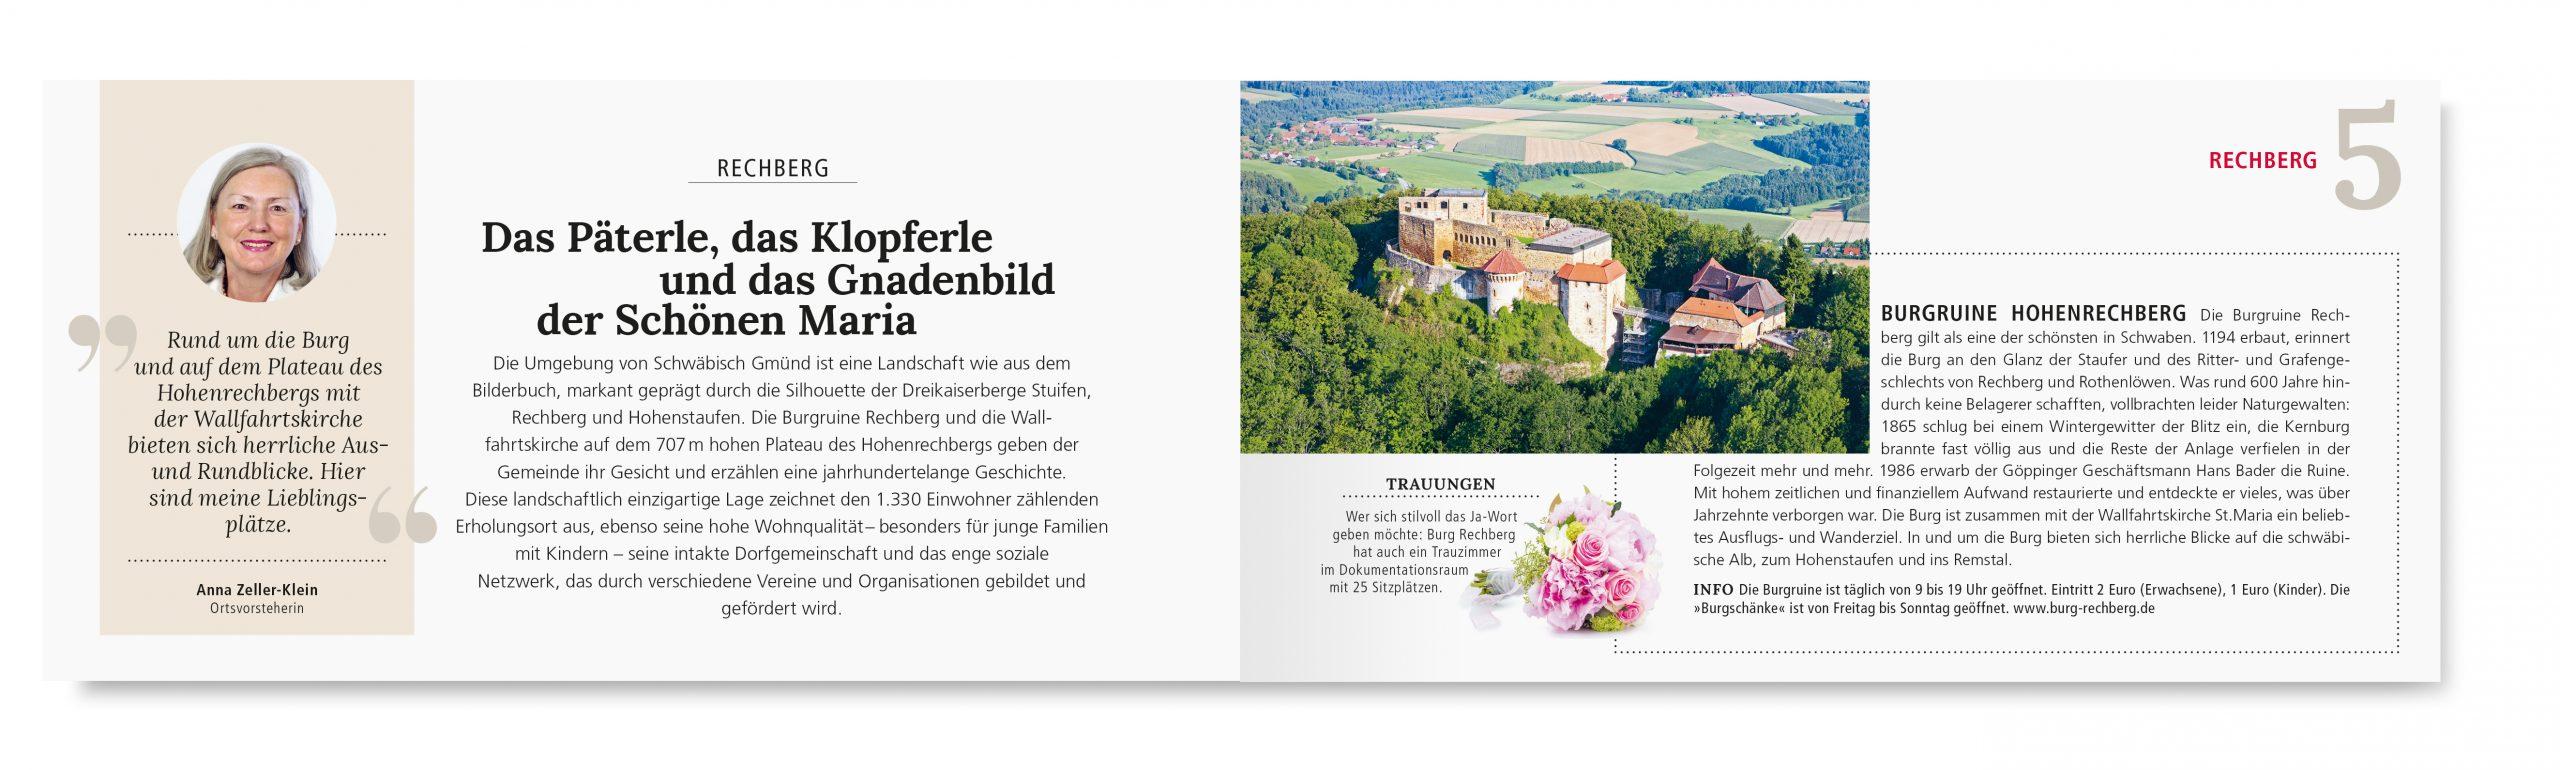 fh-web-broschuere-lieblingsorte-5-scaled.jpg